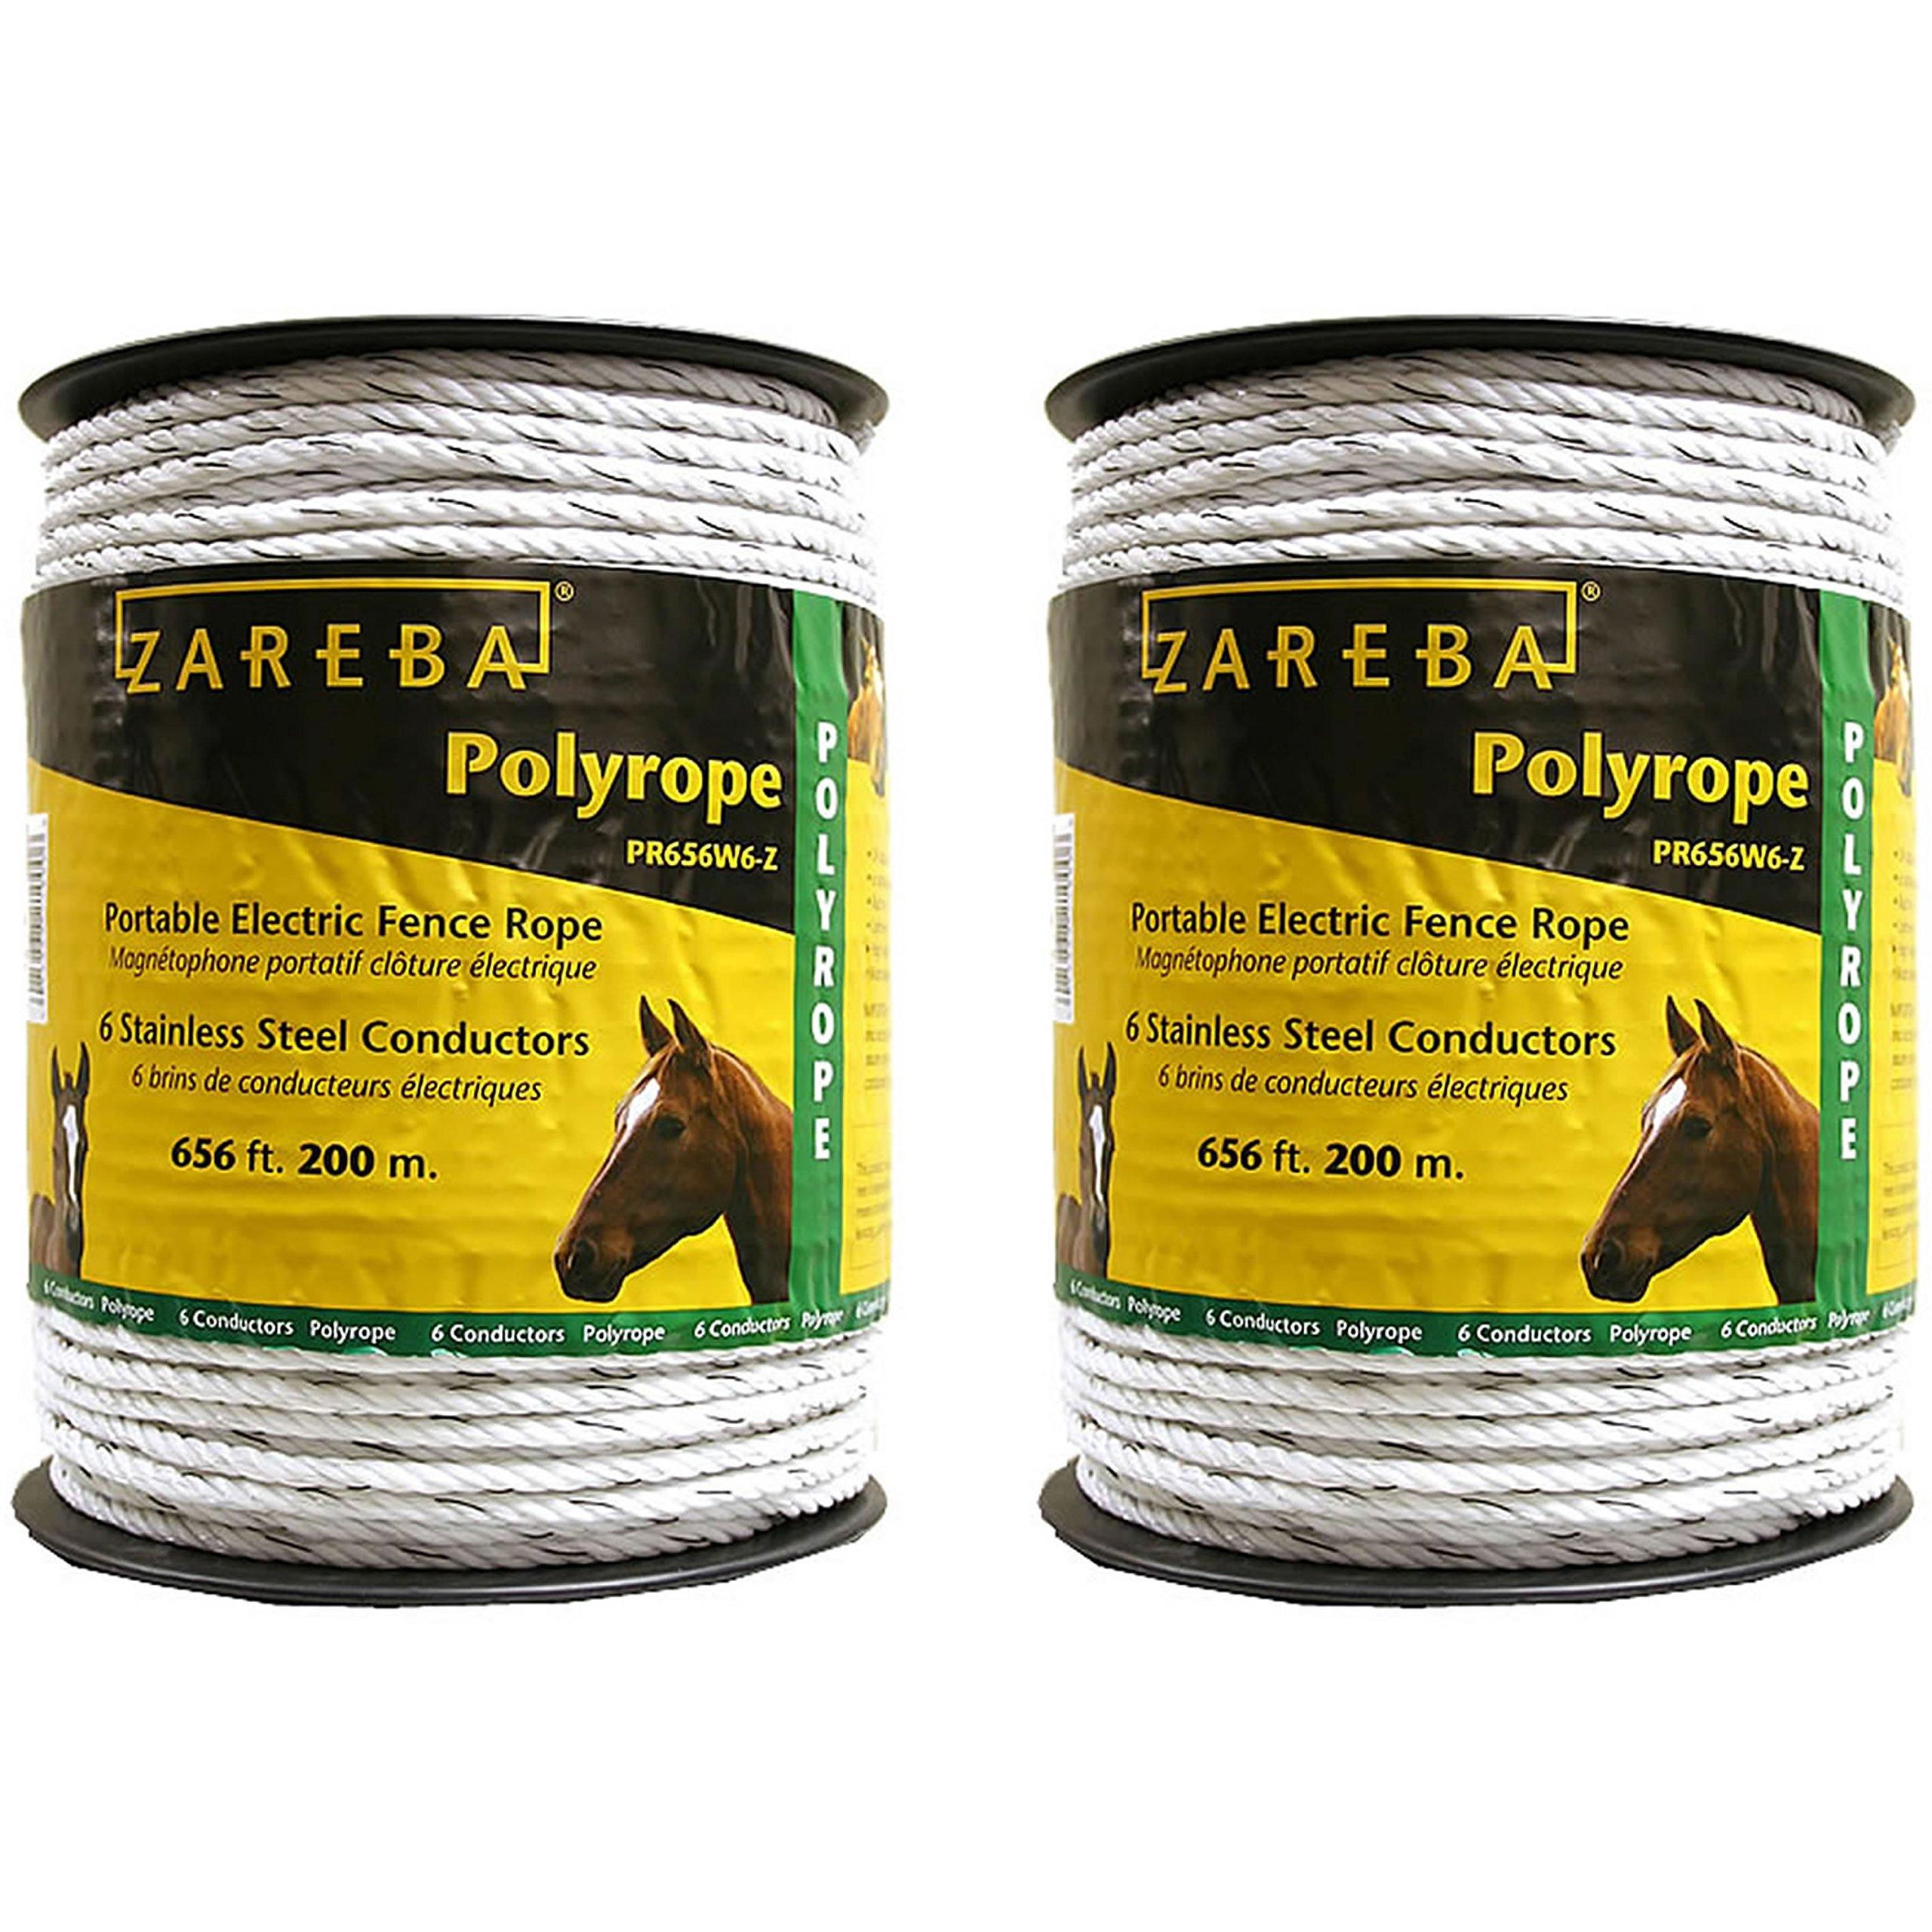 Zareba Systems PR656W6-Z Polyrope 200m 6-Conductor Portable Electric-Fence Rope (2 Pack) by Zareba